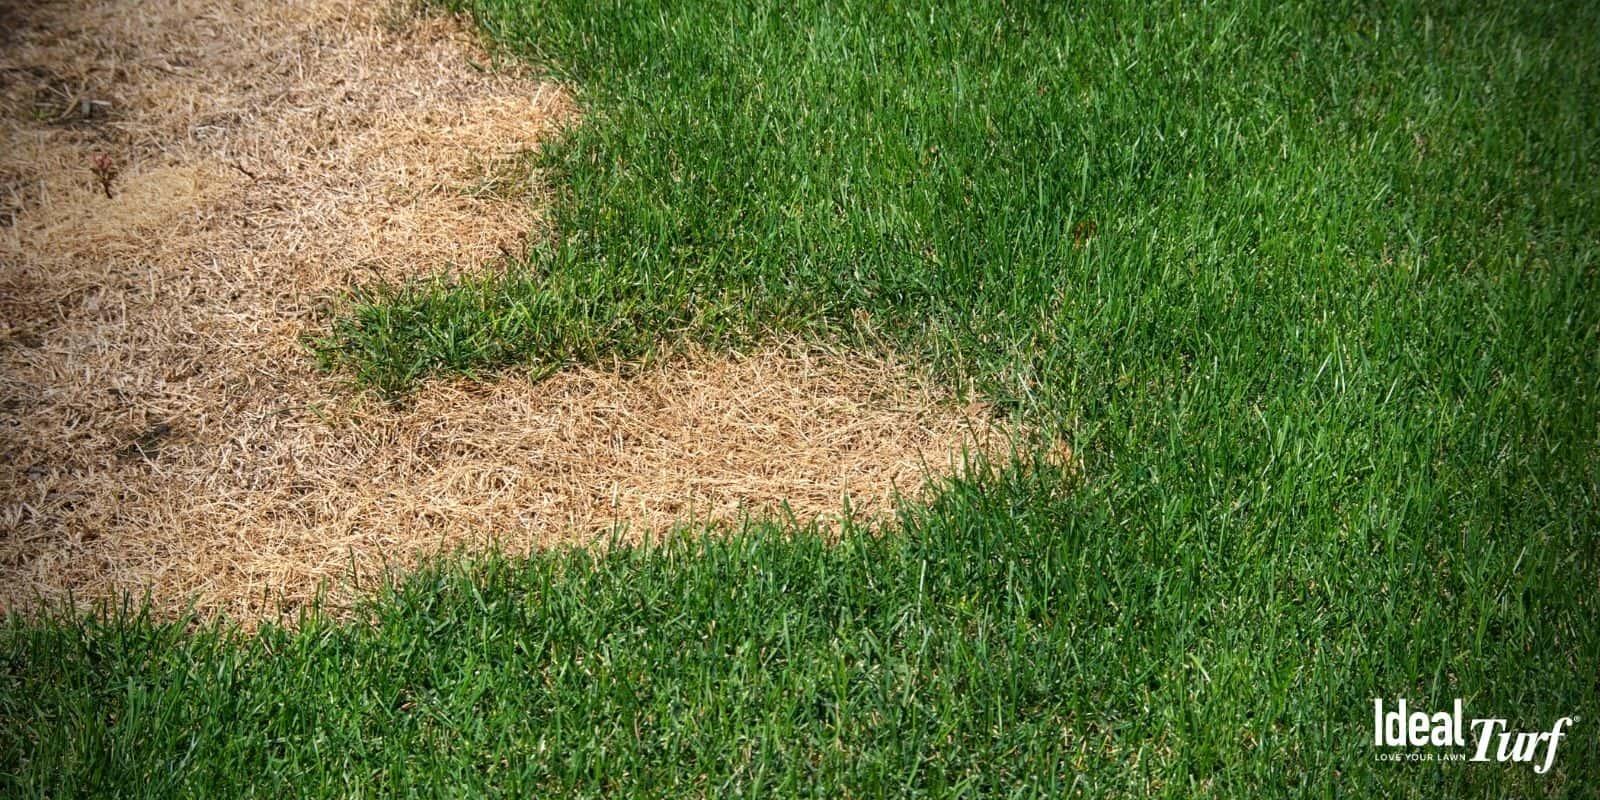 Brown Dog Urine Spots on Grass